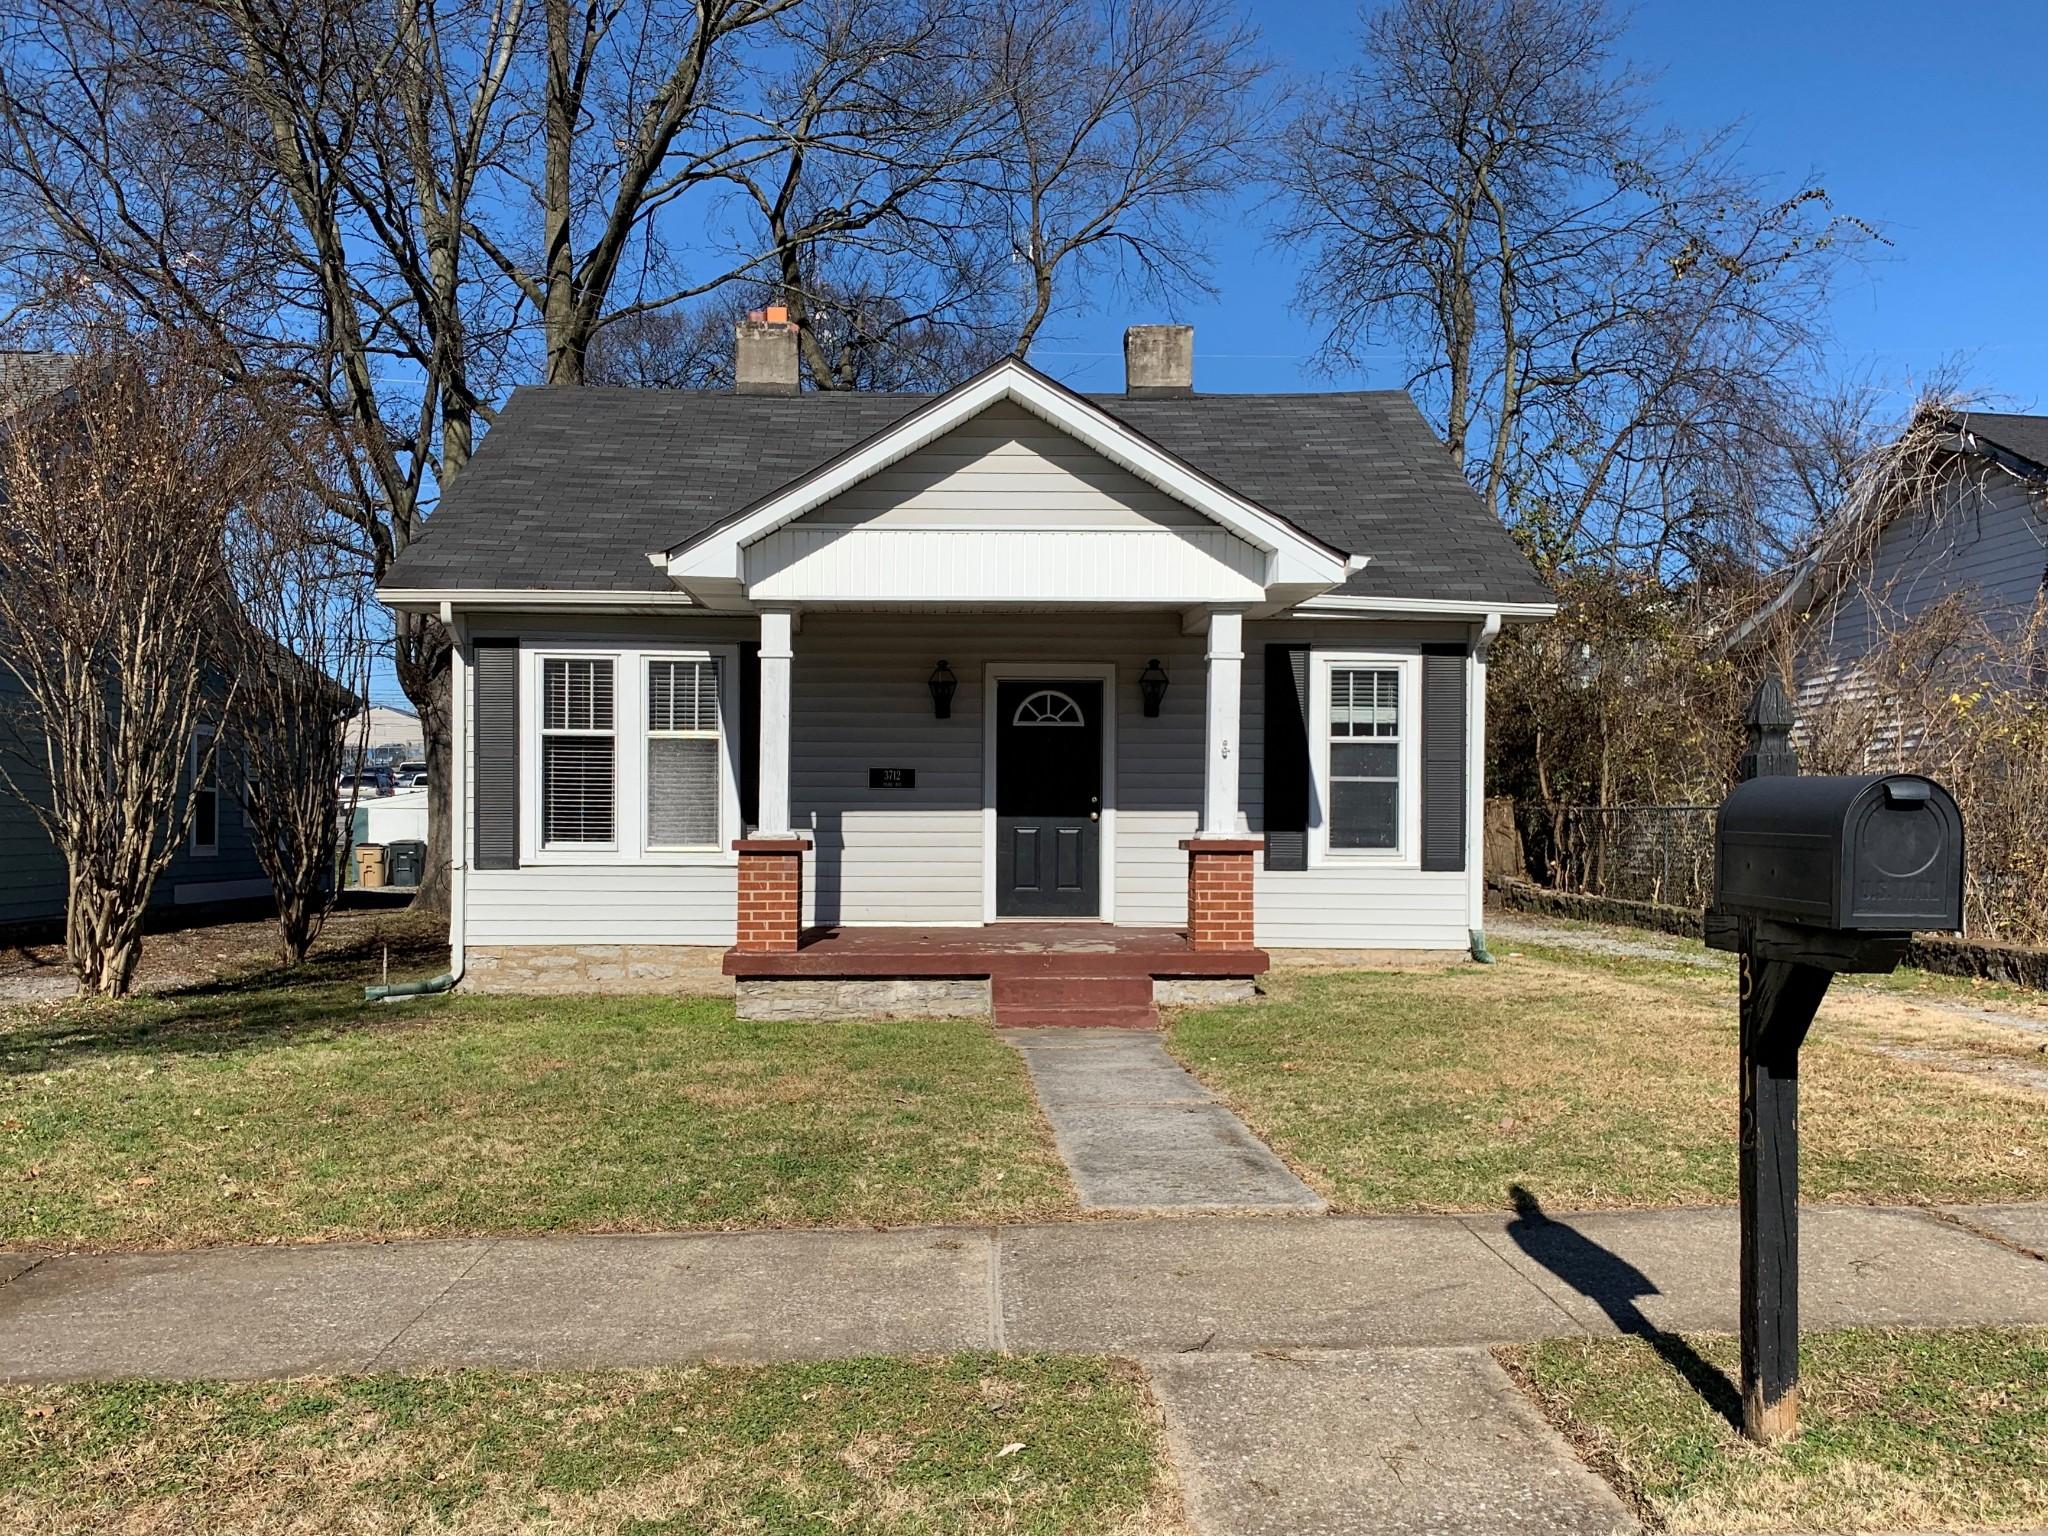 3712 Park Ave, Nashville, TN 37209 - Nashville, TN real estate listing